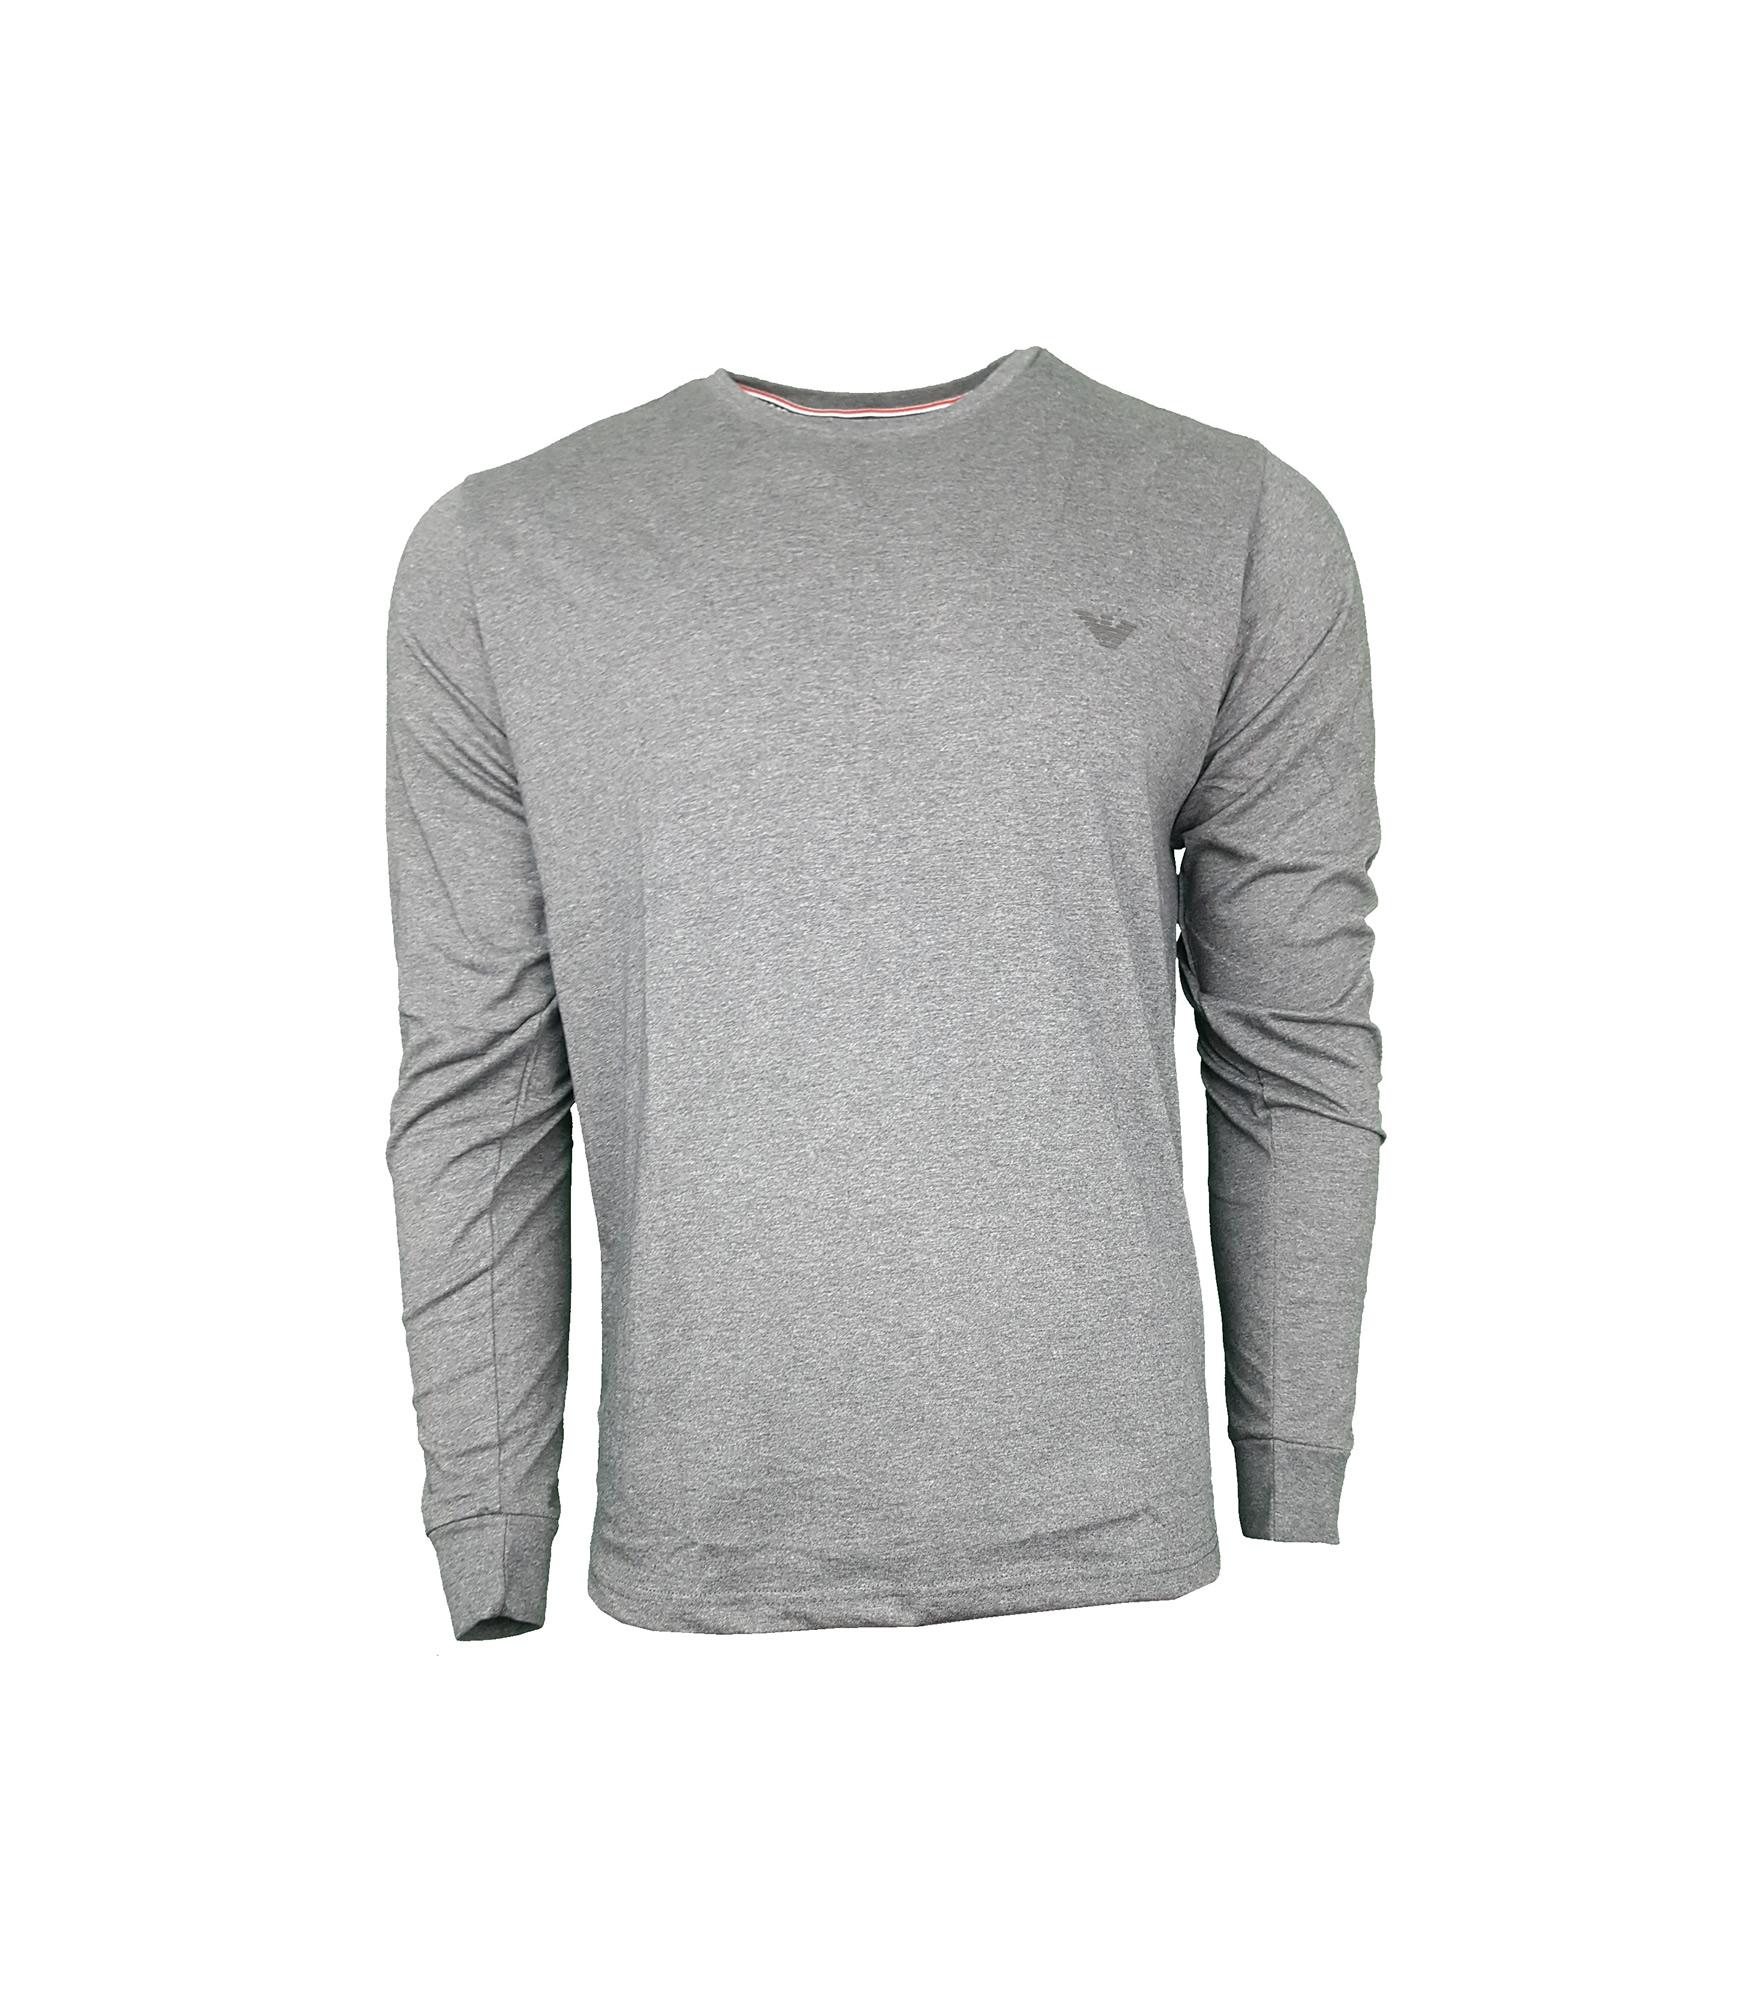 a417380d Armani Jeans Crew Neck Aj Logo T Shirt White | Lixnet AG